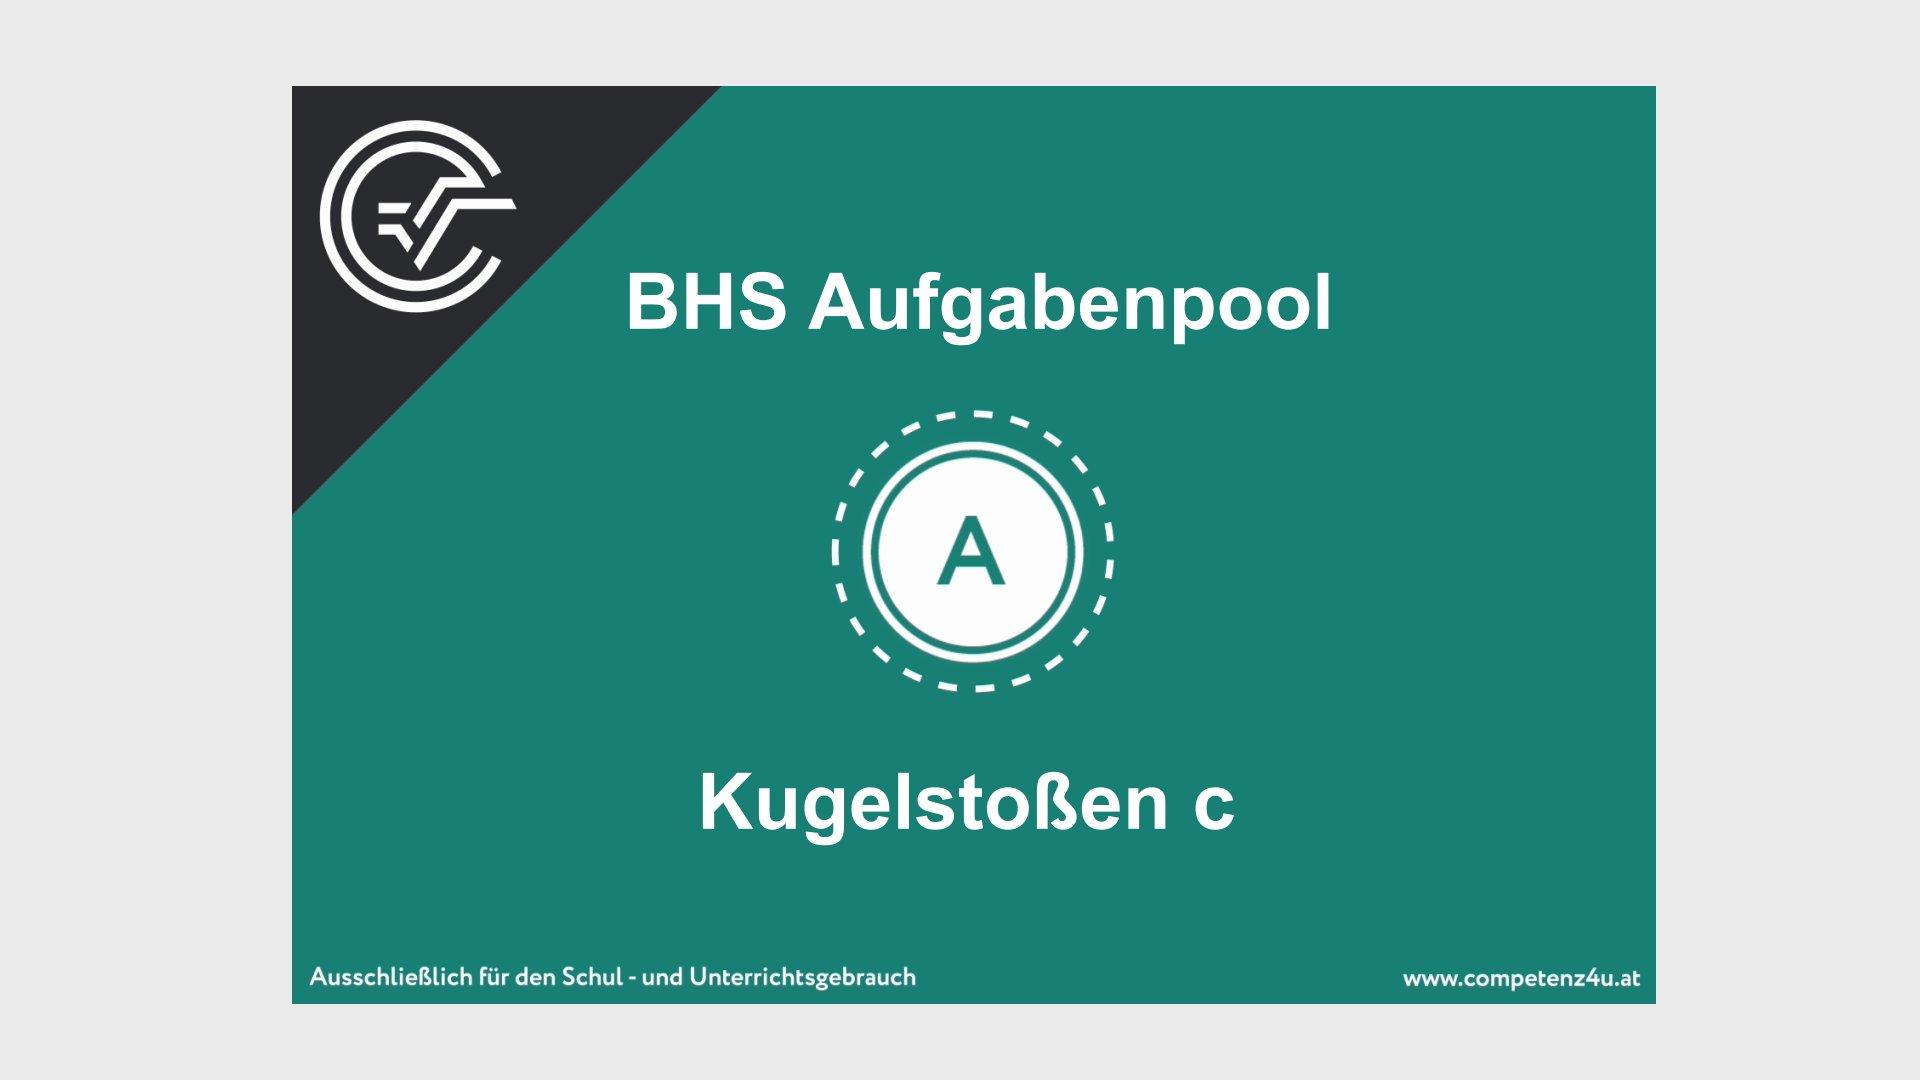 A_060 Kugelstoßen Zentralmatura Mathematik BMB Aufgabenpool BHS Teil A Bifie  Bundesministerium für Bildung